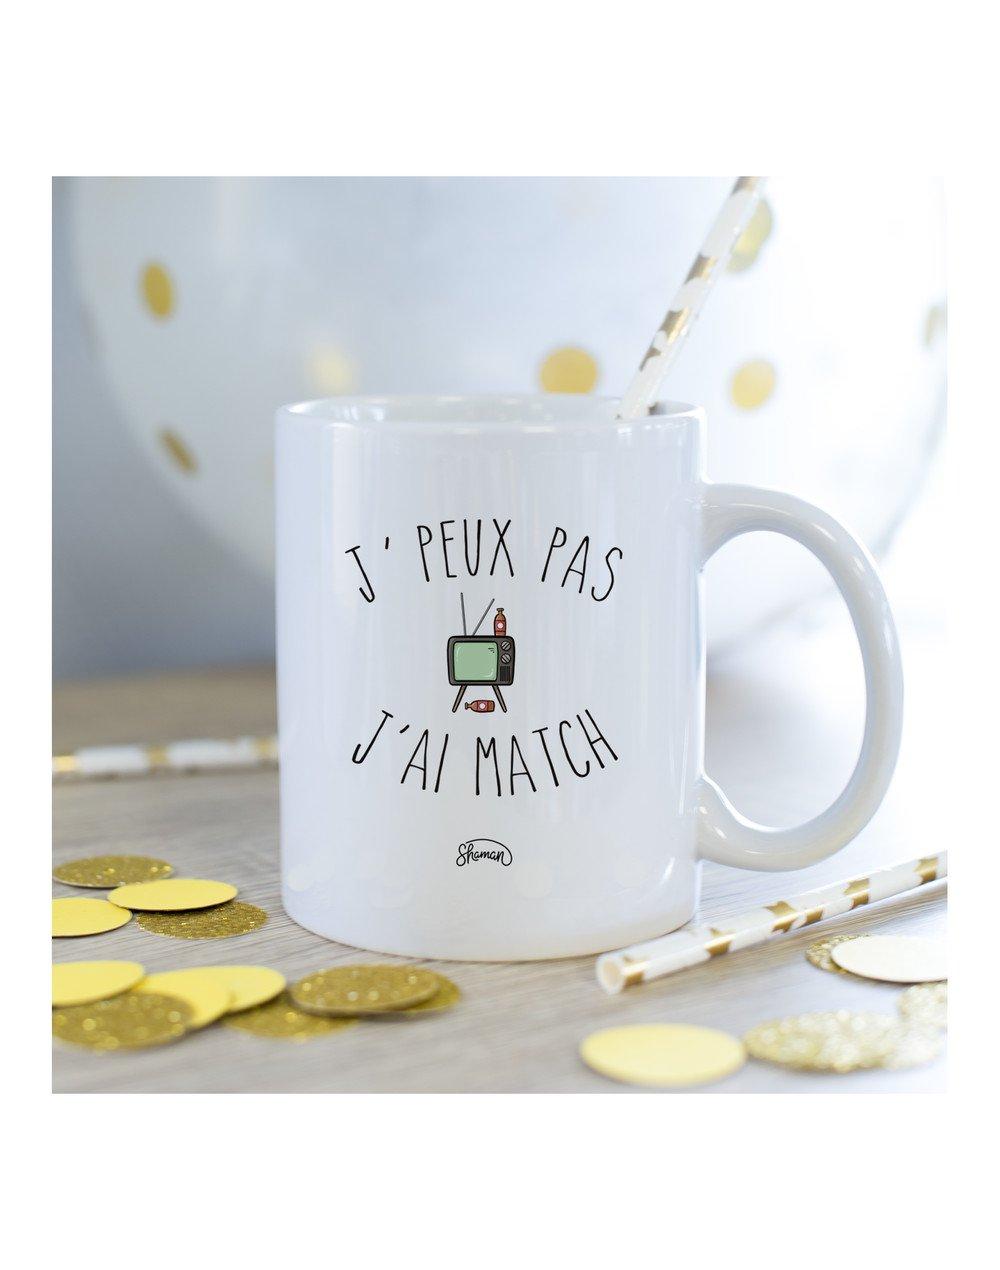 Mug J'peux pas match